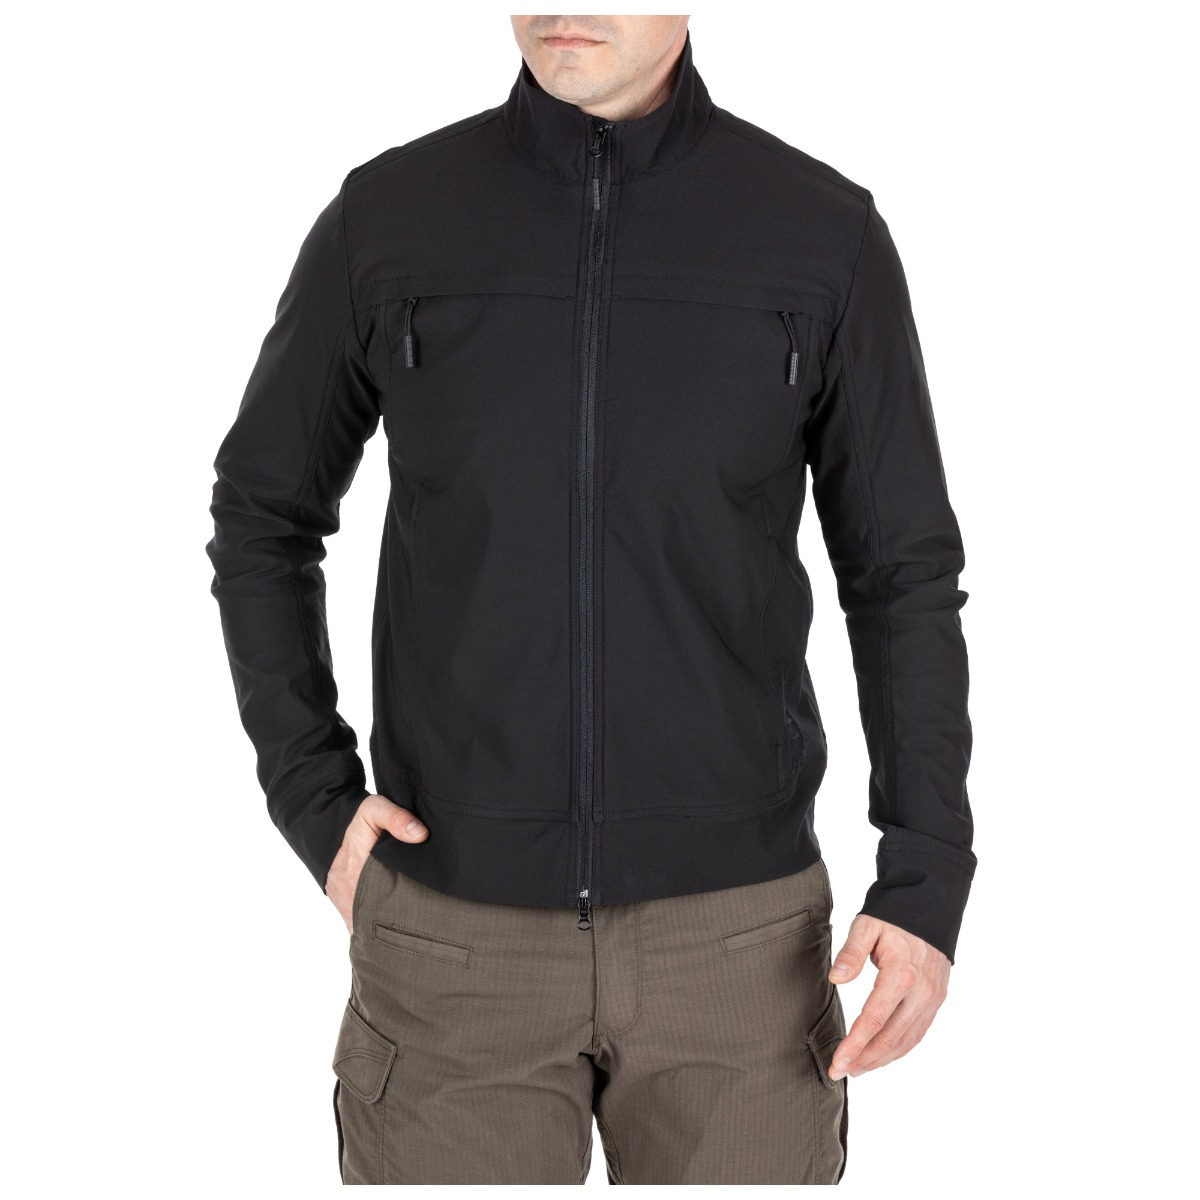 5.11 Tactical Men's Preston Jacket, Size L (CCW Concealed Carry)